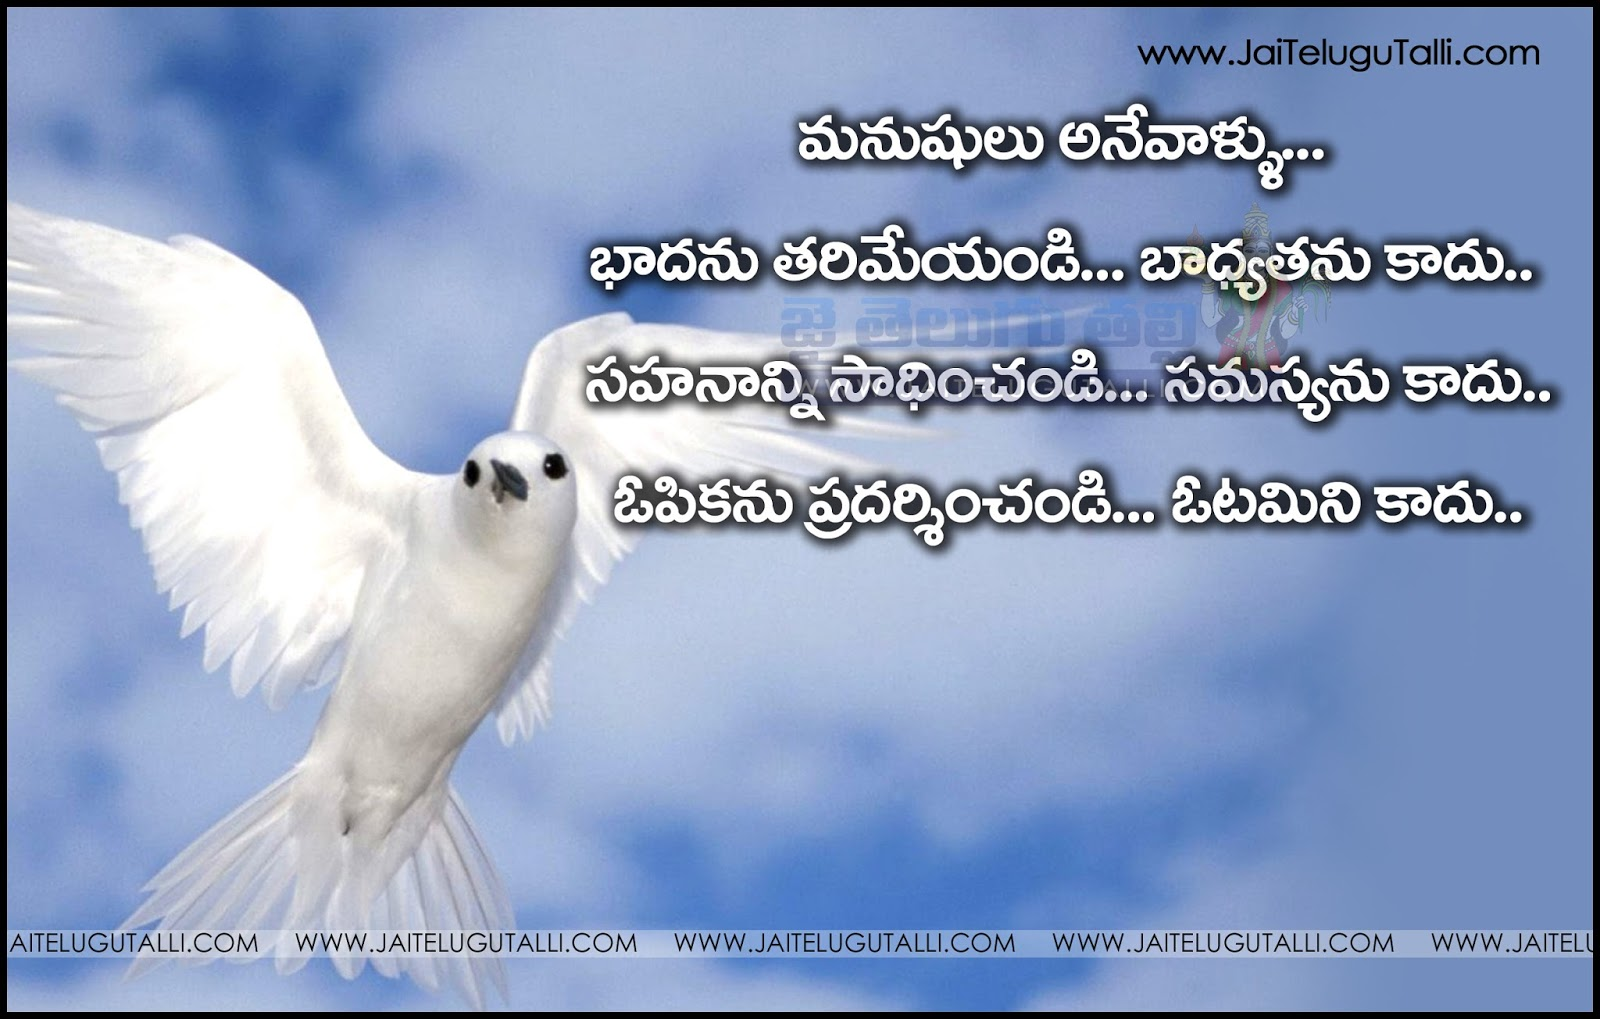 Sayings On Life Inspirational Quotes Telugu Inspirational Quotations And Life Motivational Sayings Hd